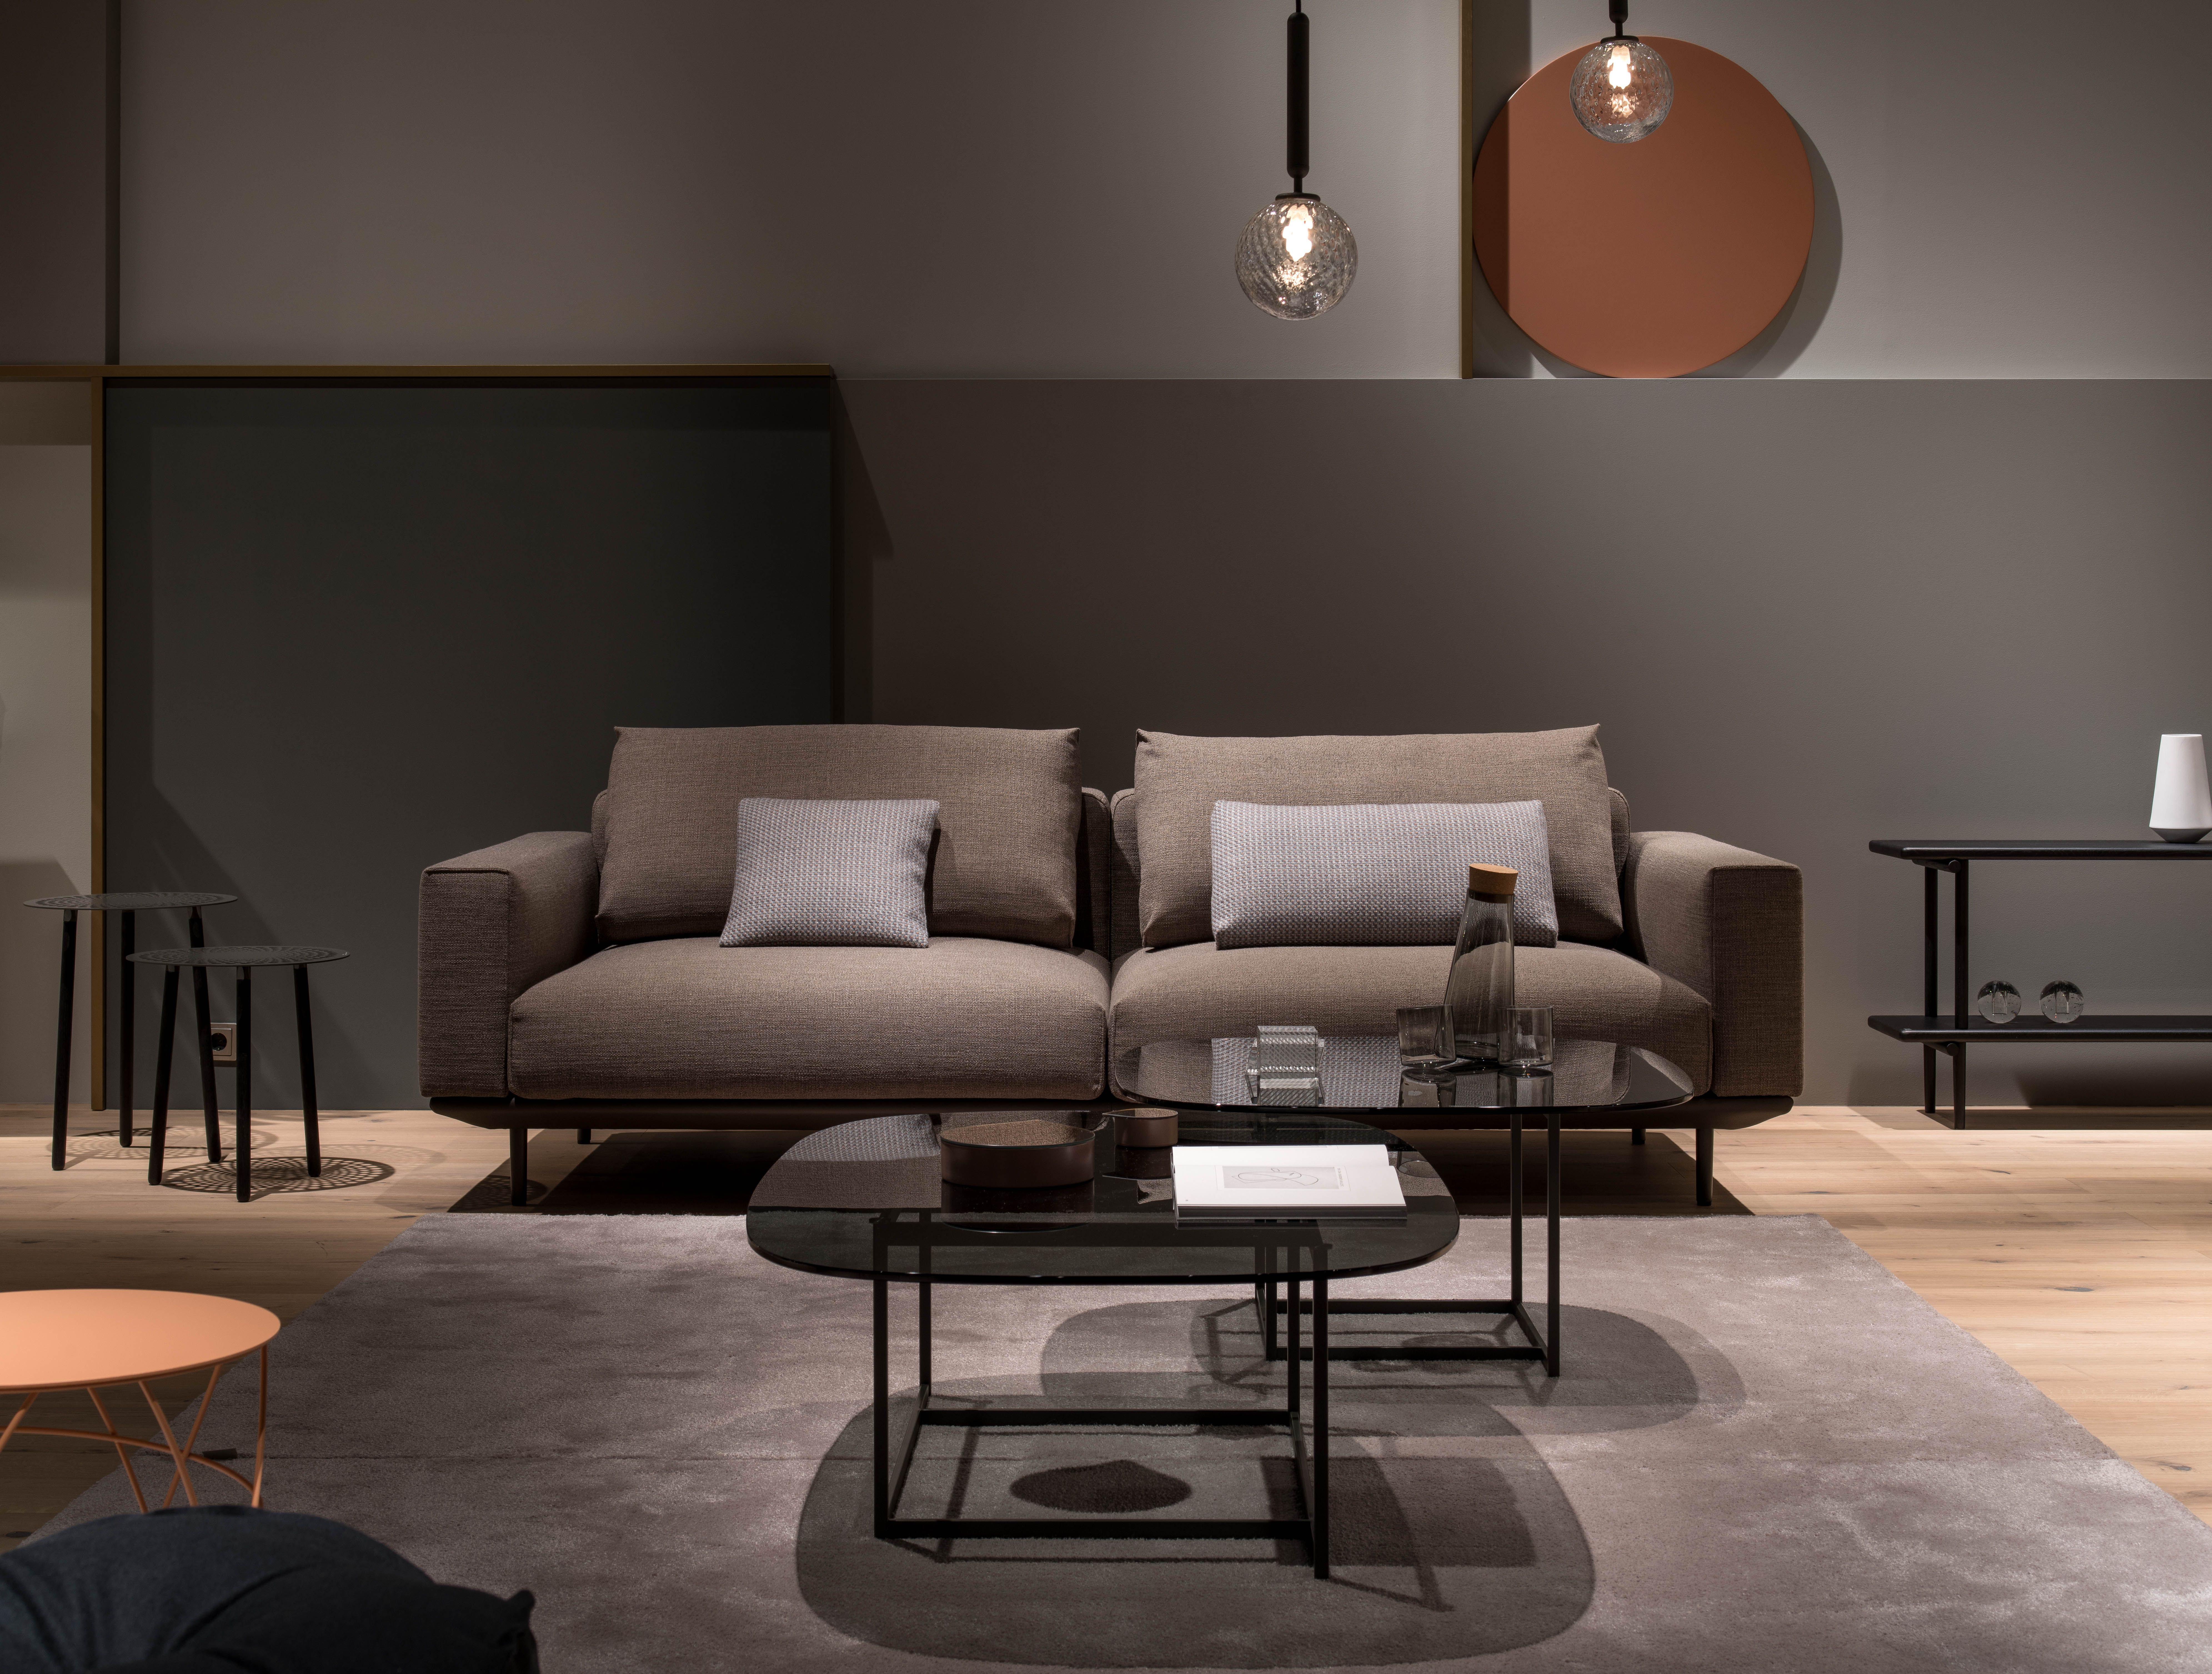 Rolf Benz Volo Sectional Sofa Contemporary Sectional Sofa